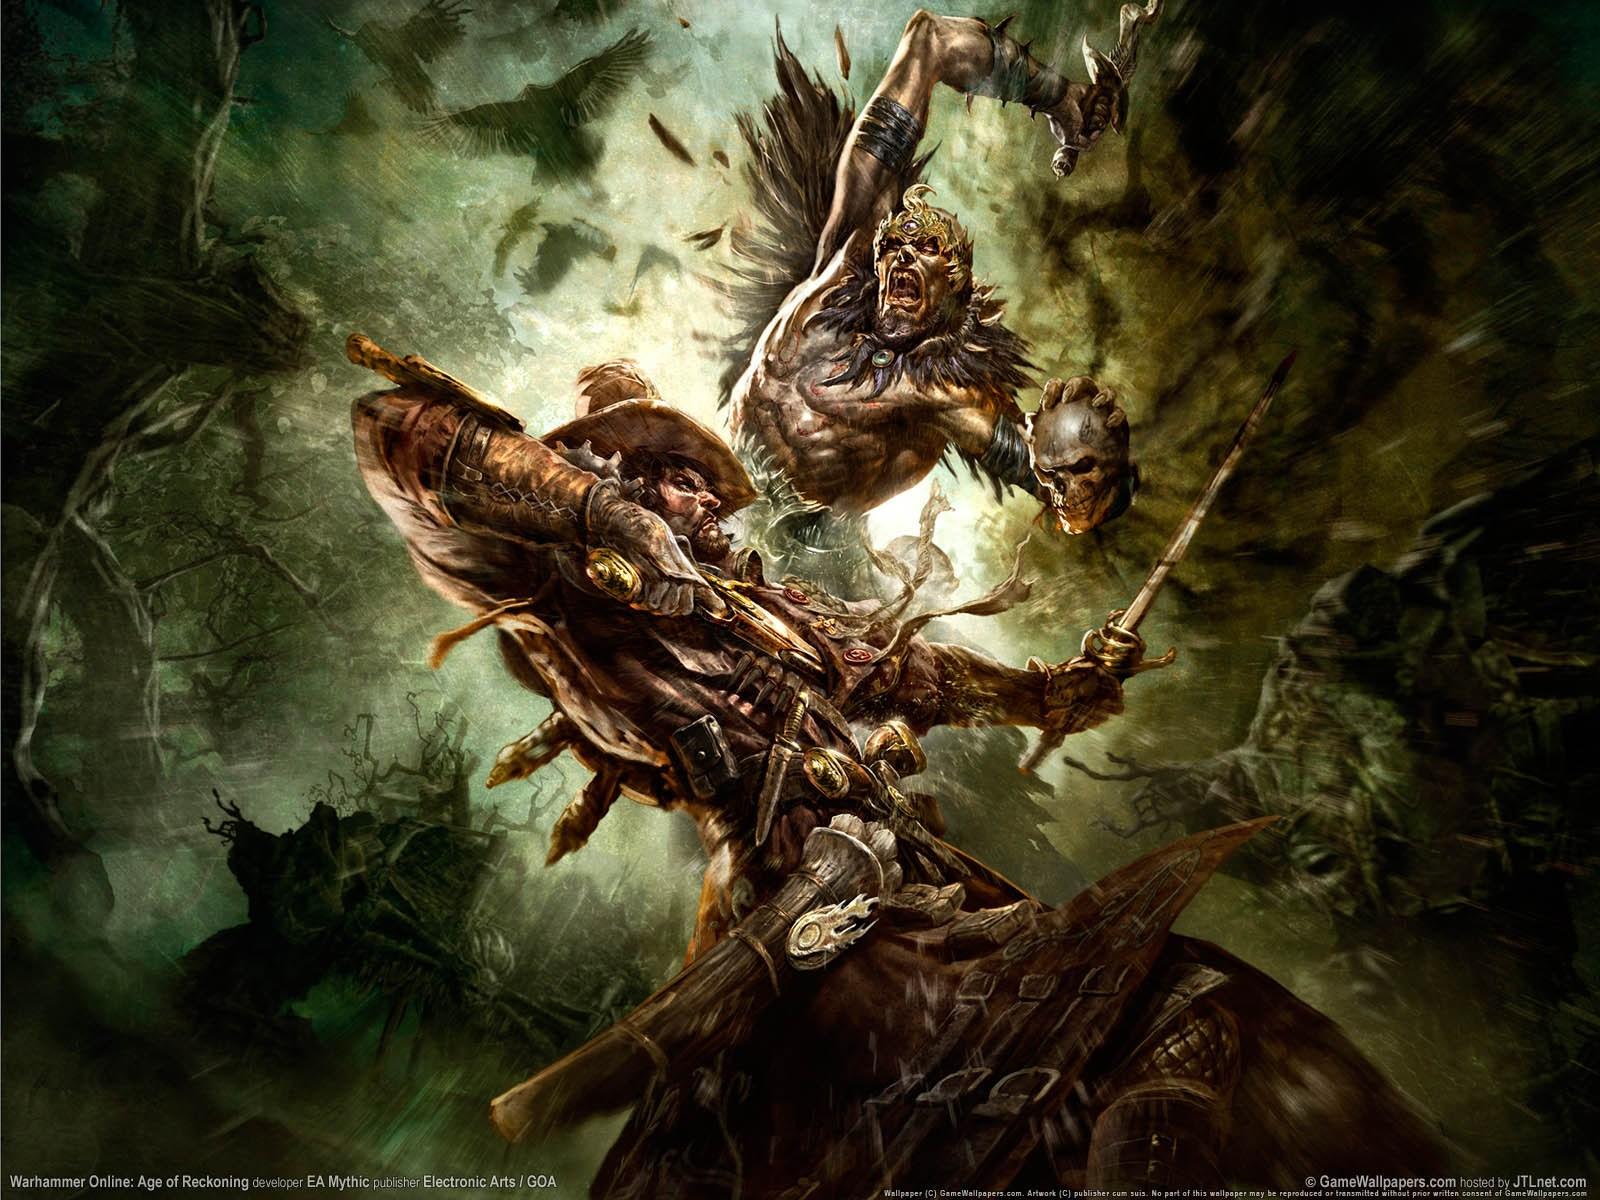 warhammer-online-age-of-reckoning-art-626.jpg